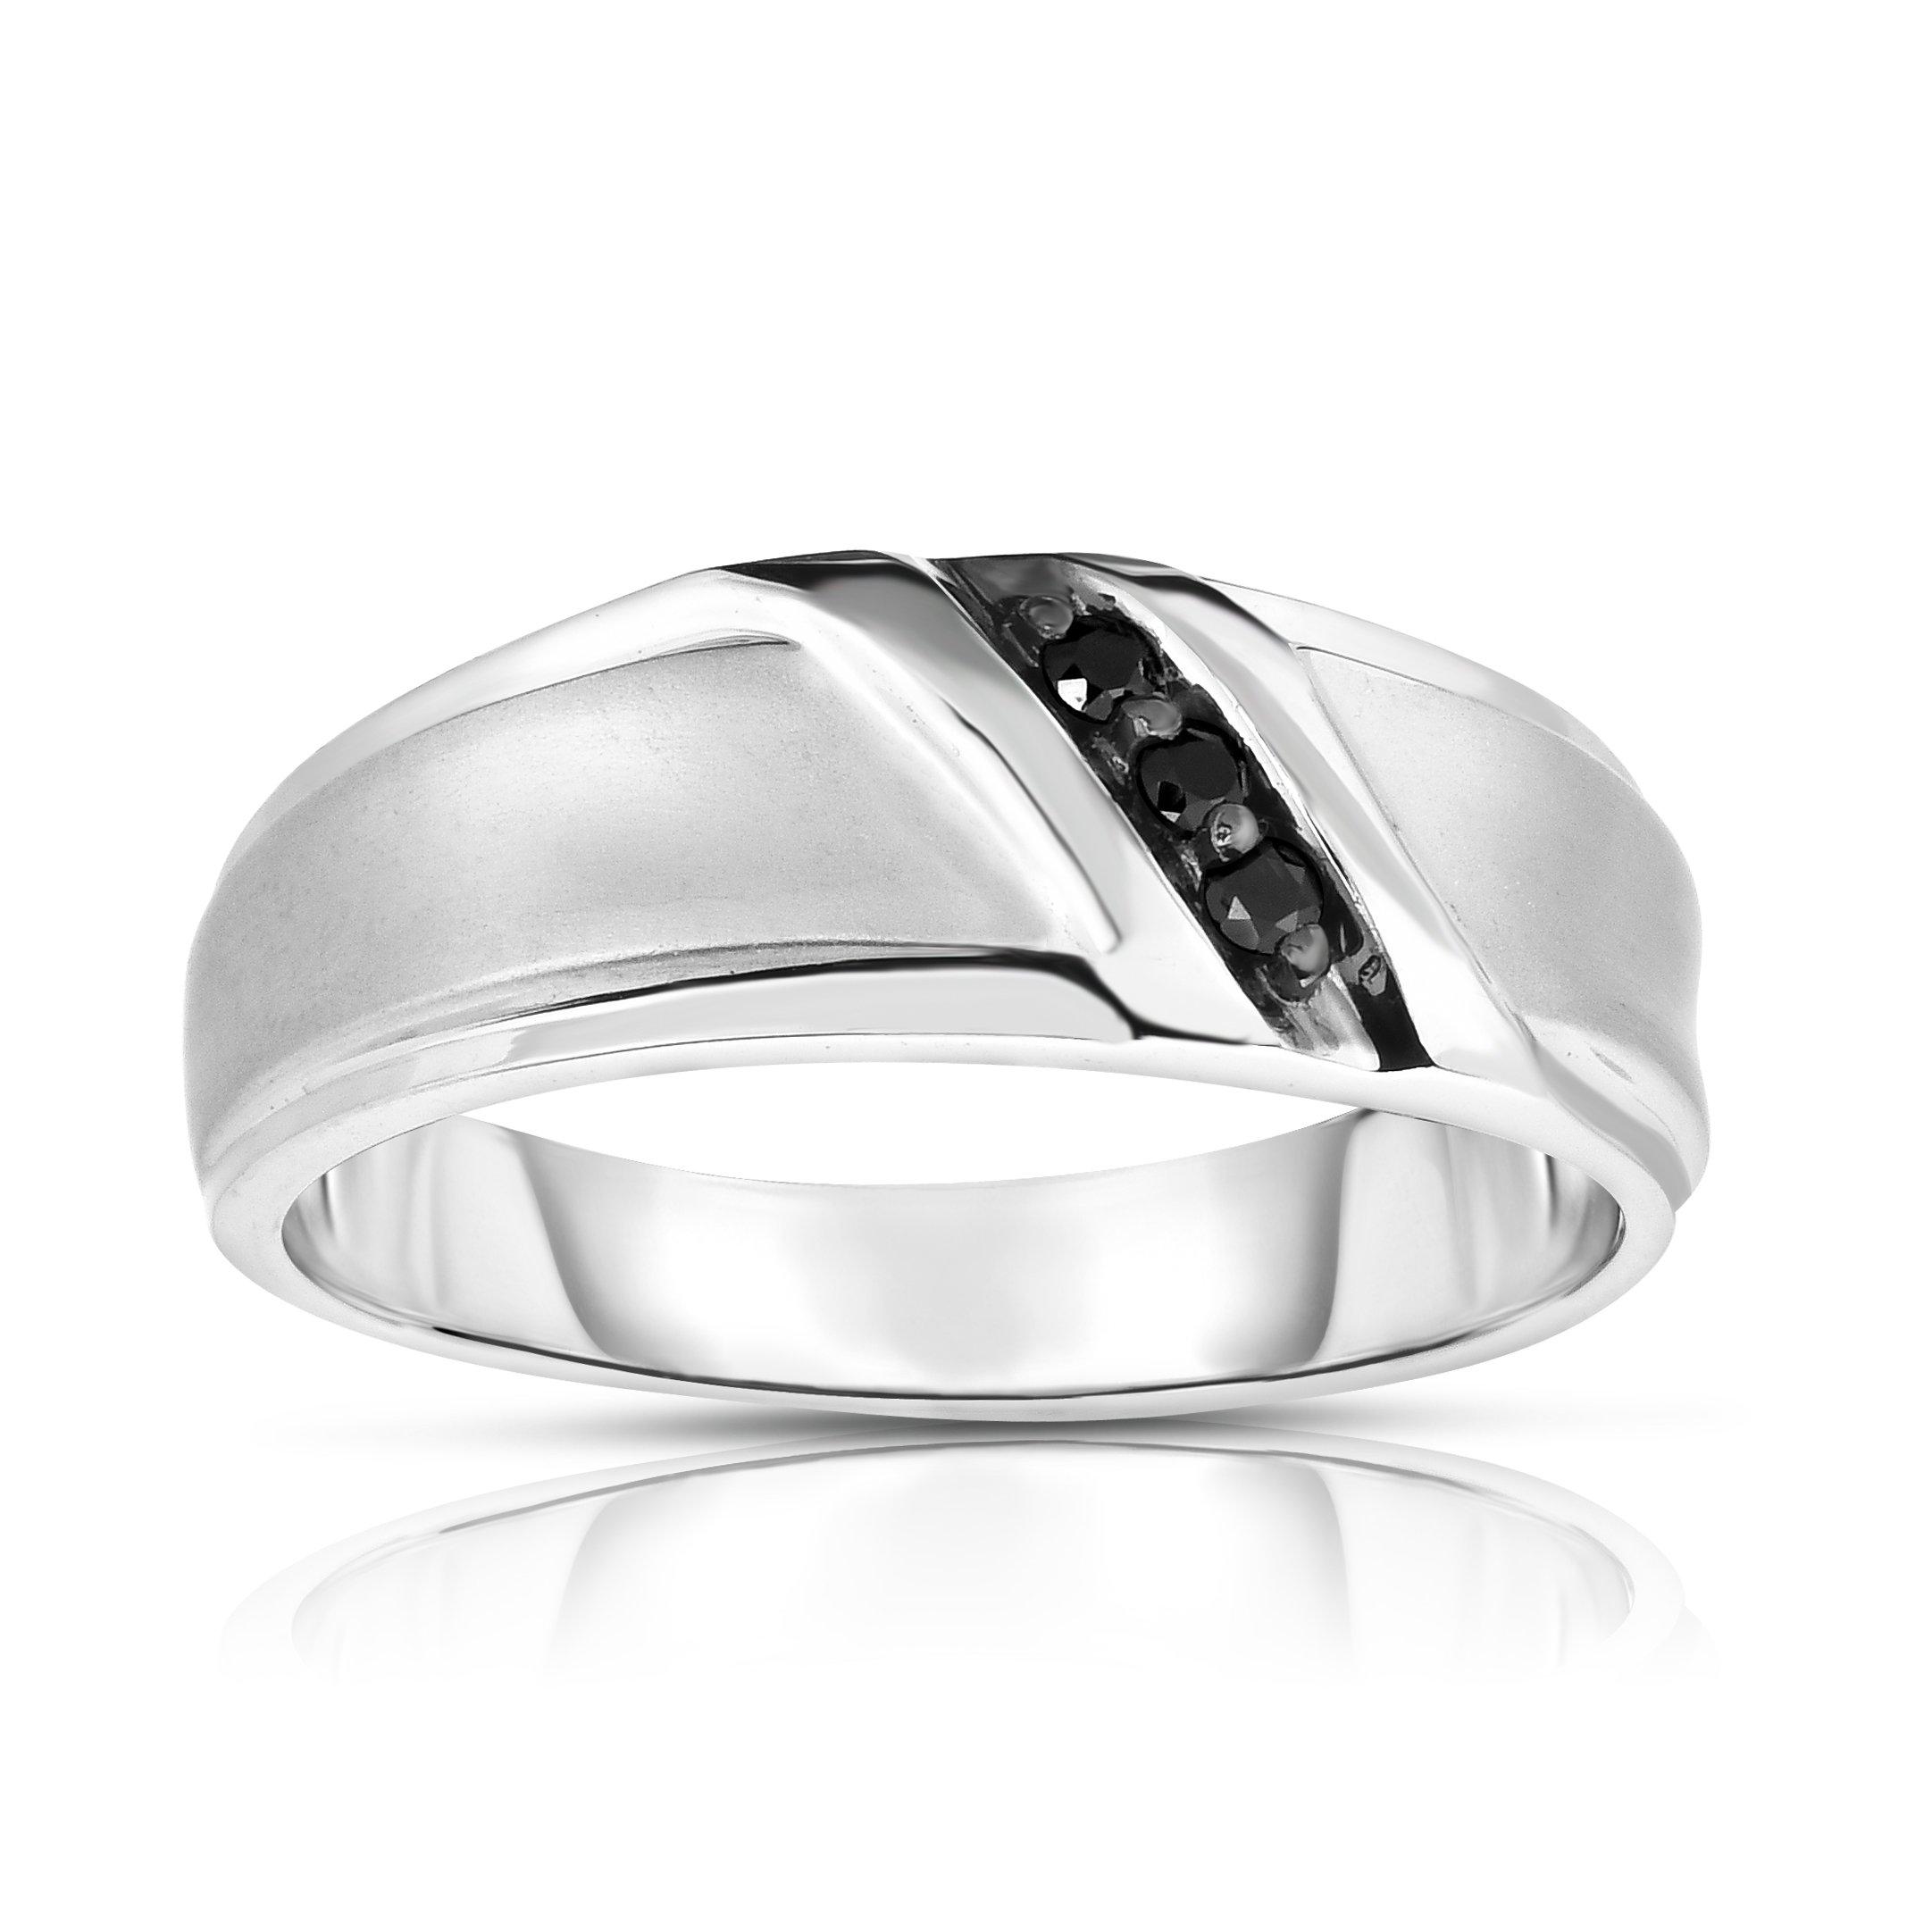 Noray Designs 14K White Gold Black Diamond (0.08 Ct, I1-I2 Clarity, Black Color) Men's 3-Stone Ring